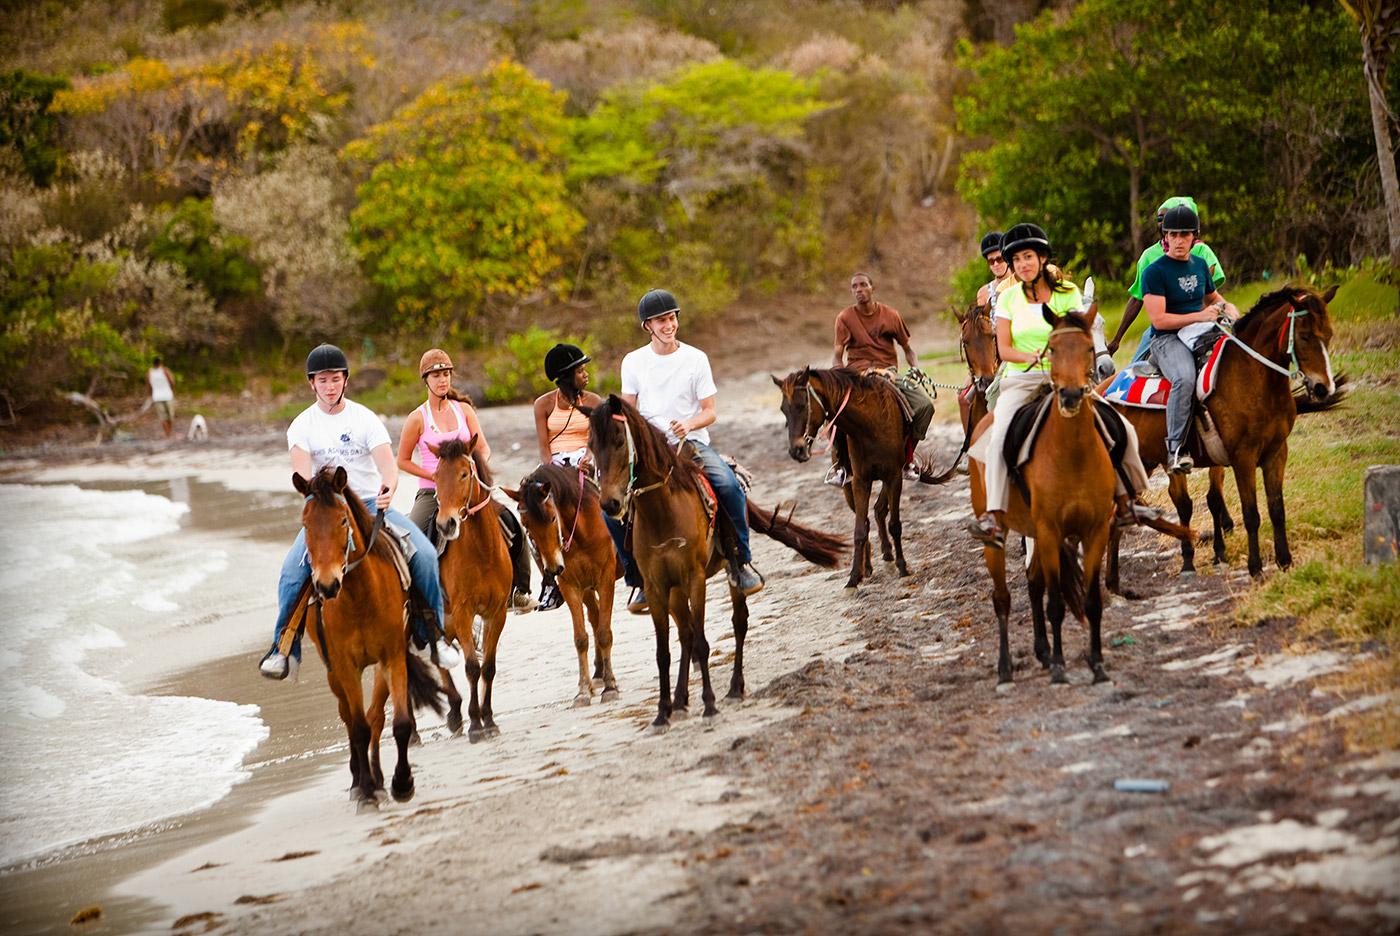 St Lucia Adventure Tours: Horseback Ride 'n' Swim